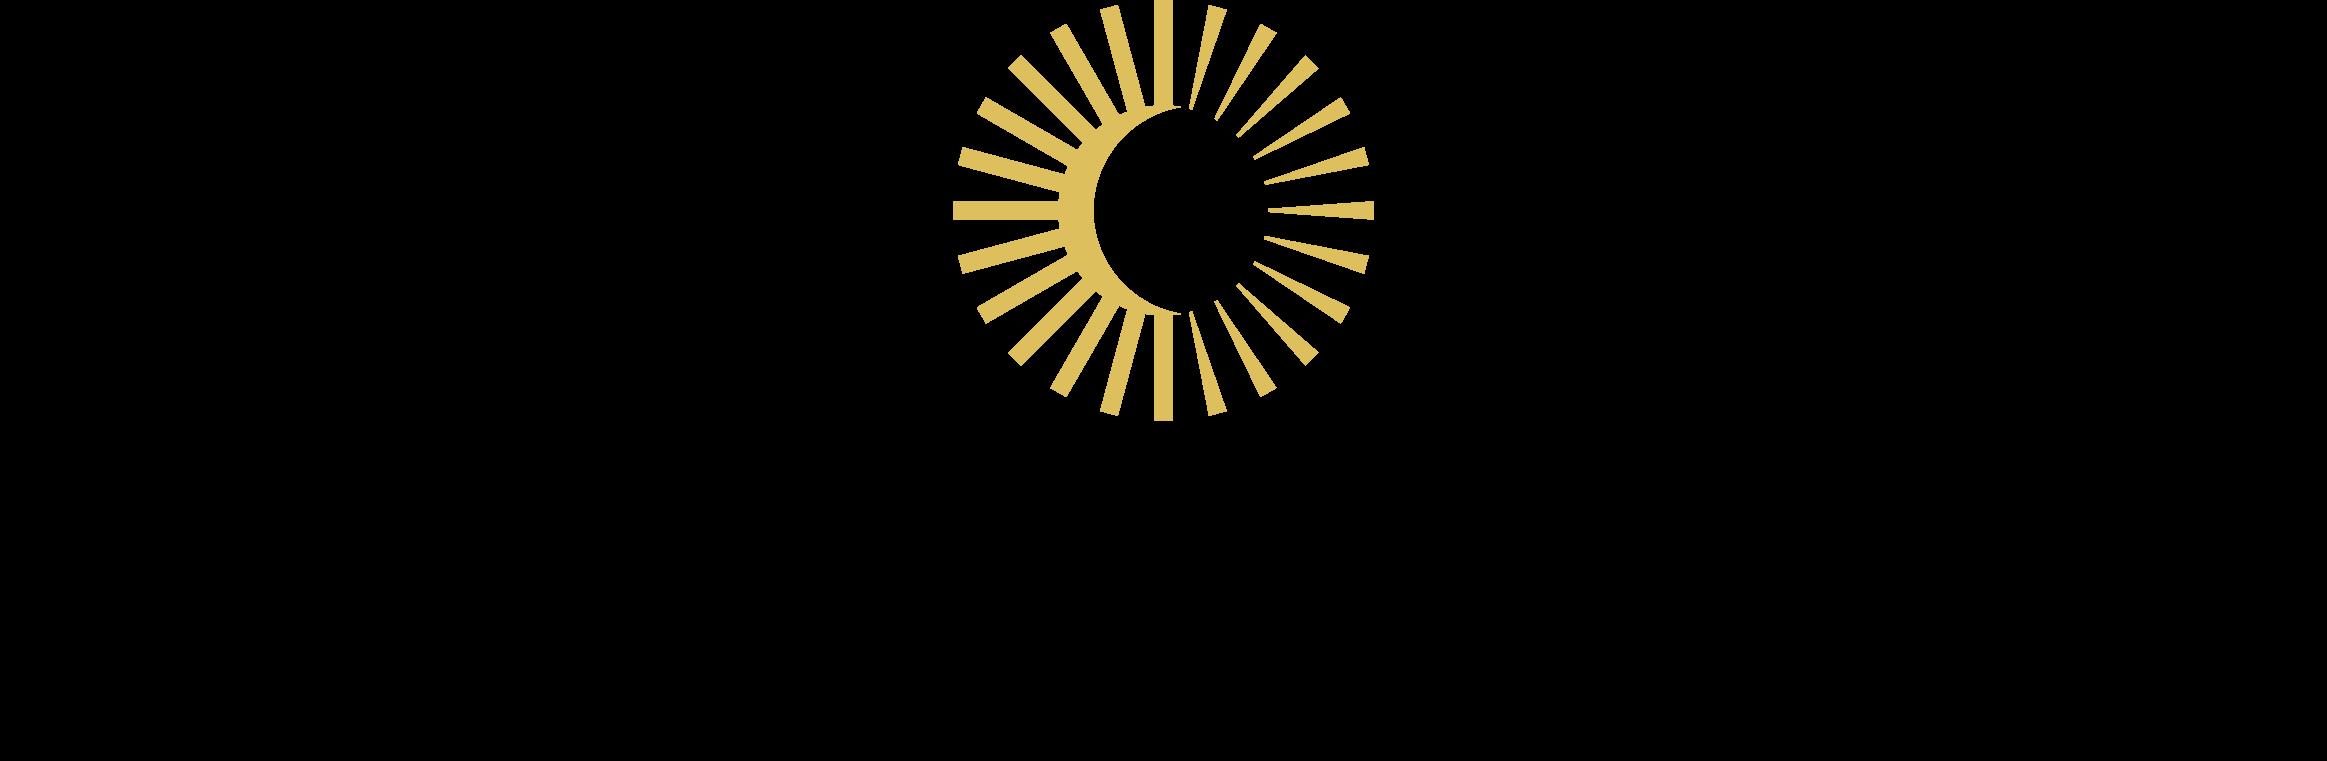 AubergeResorts logo